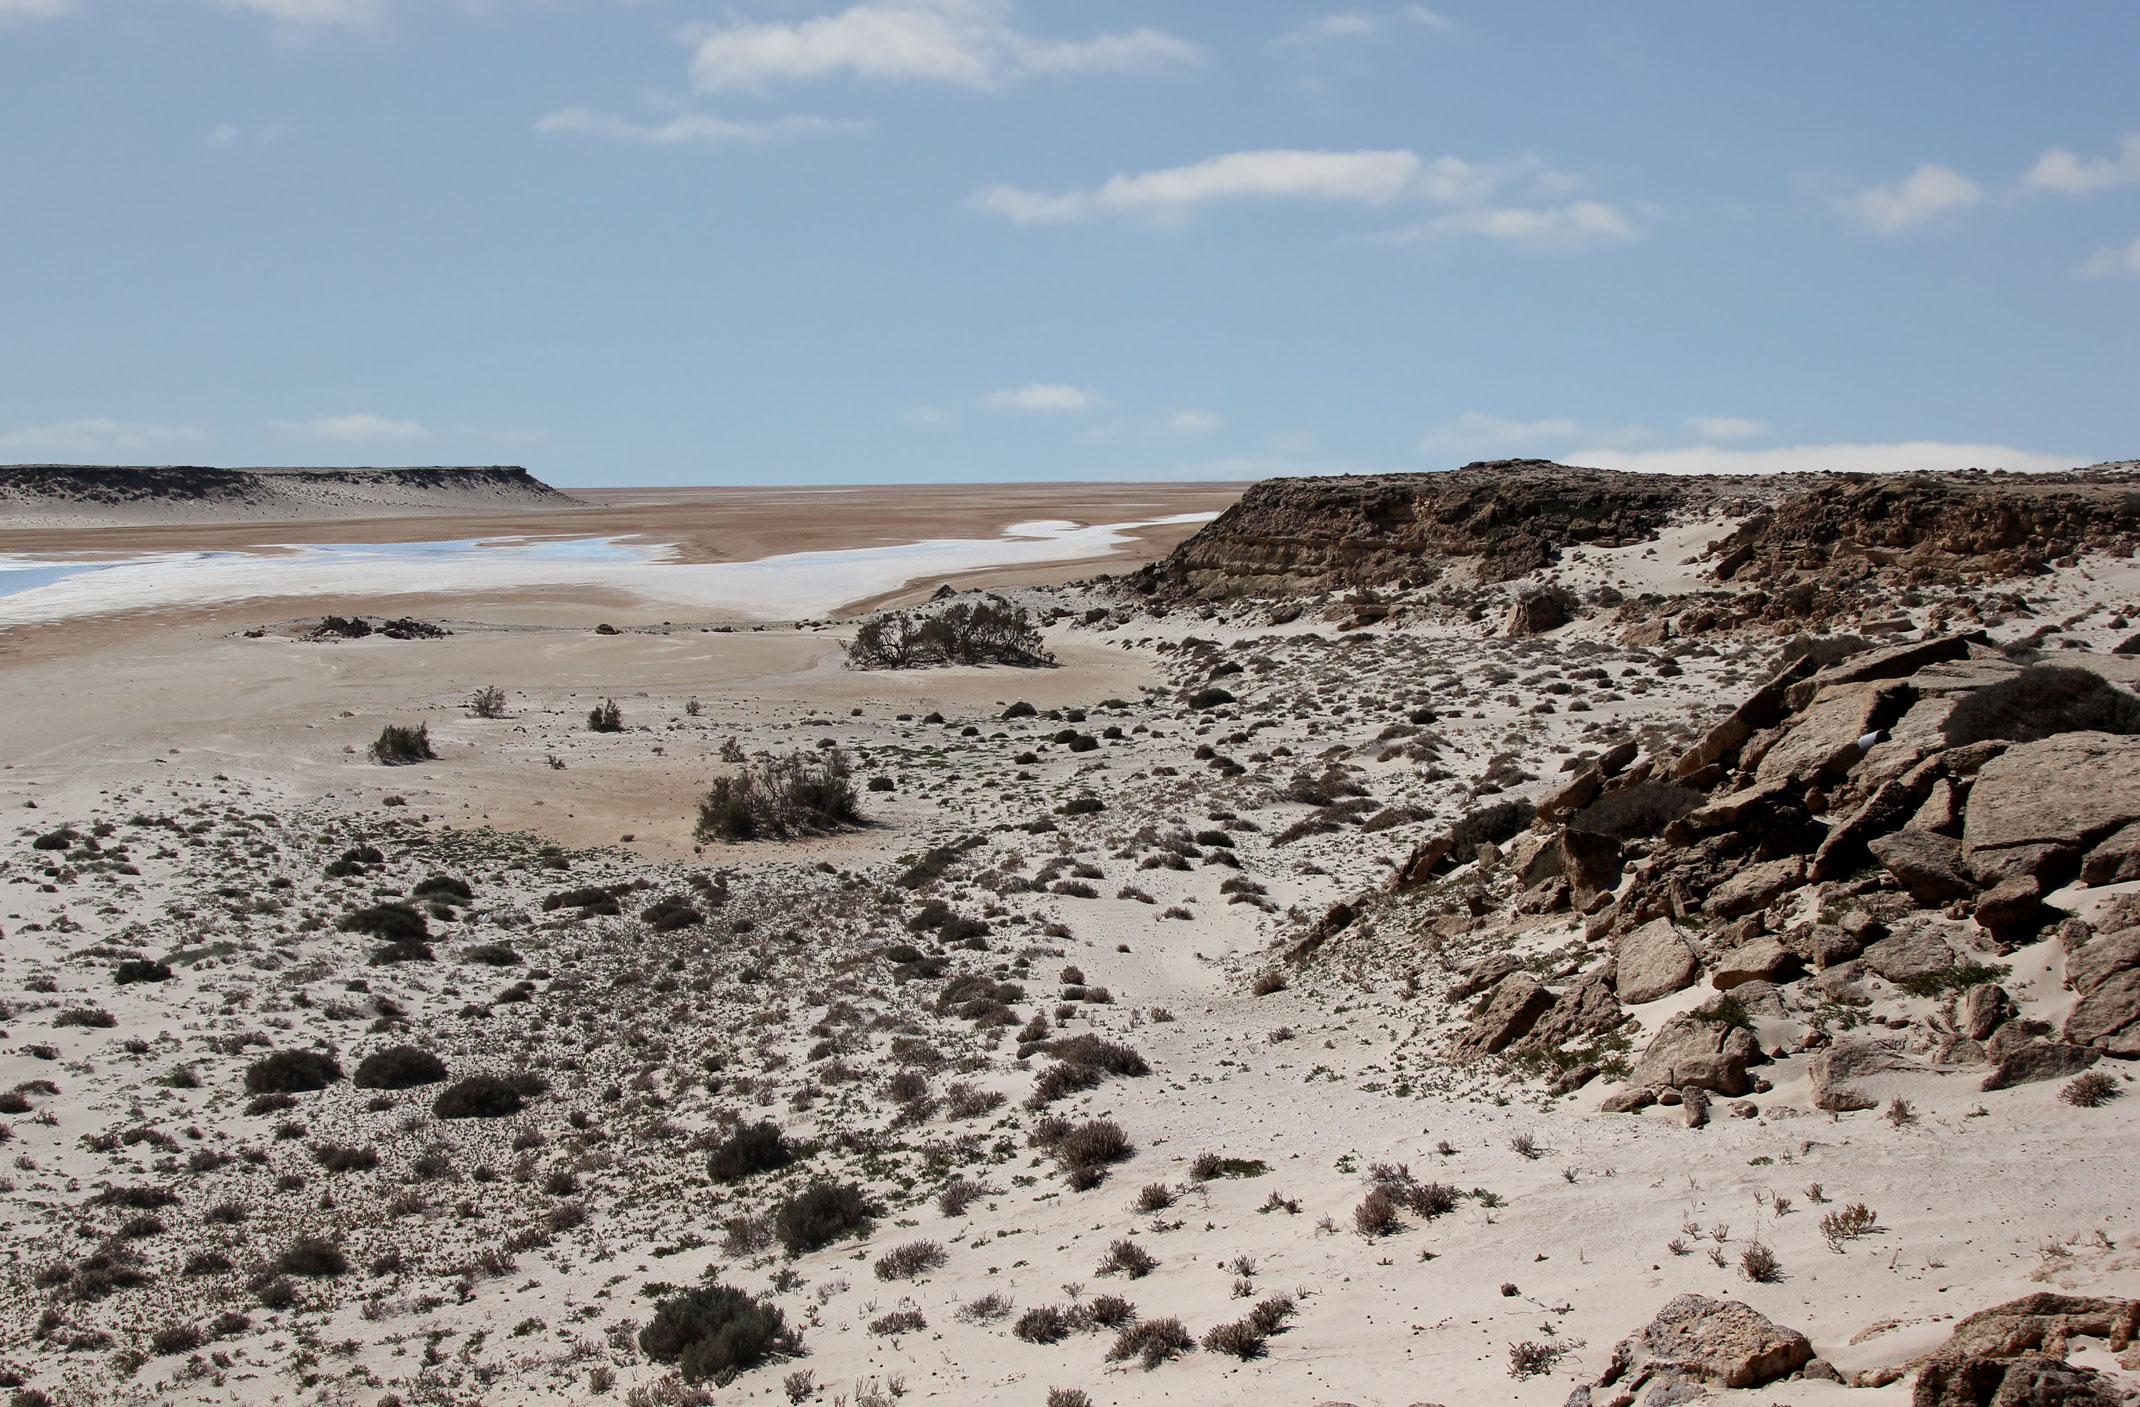 Maroko,Sahara Zachodnia,Zatoka Cintra